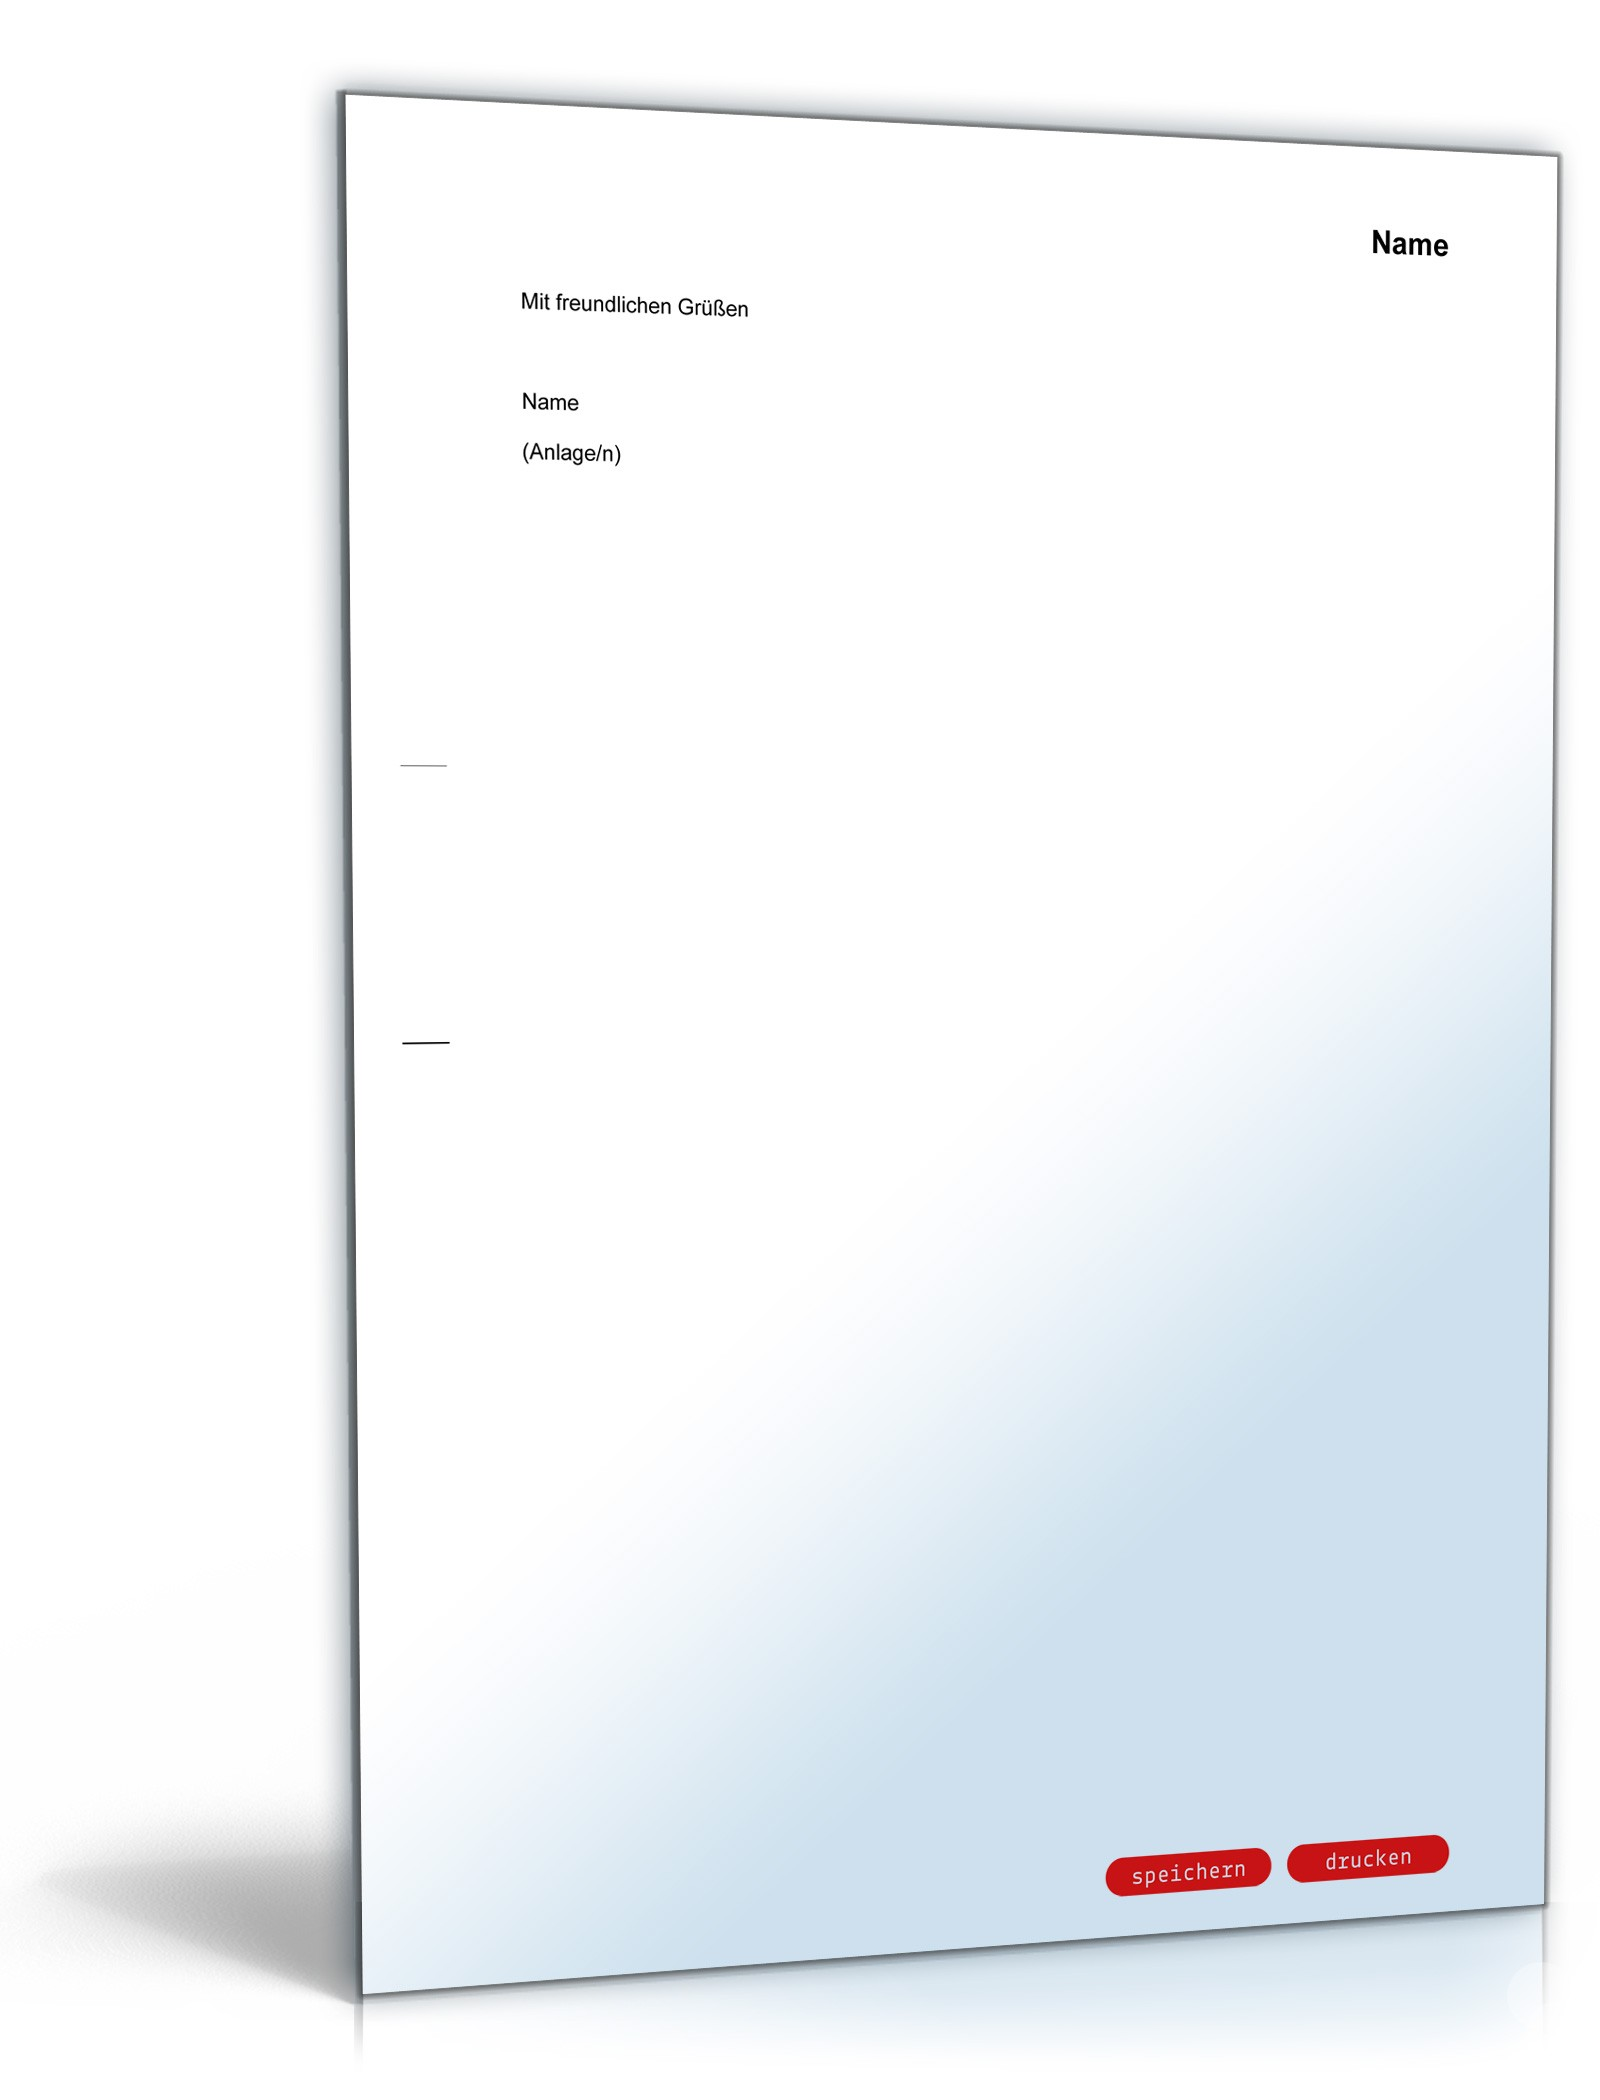 Vergleichsangebot an privaten Gläubiger | Muster zum Download